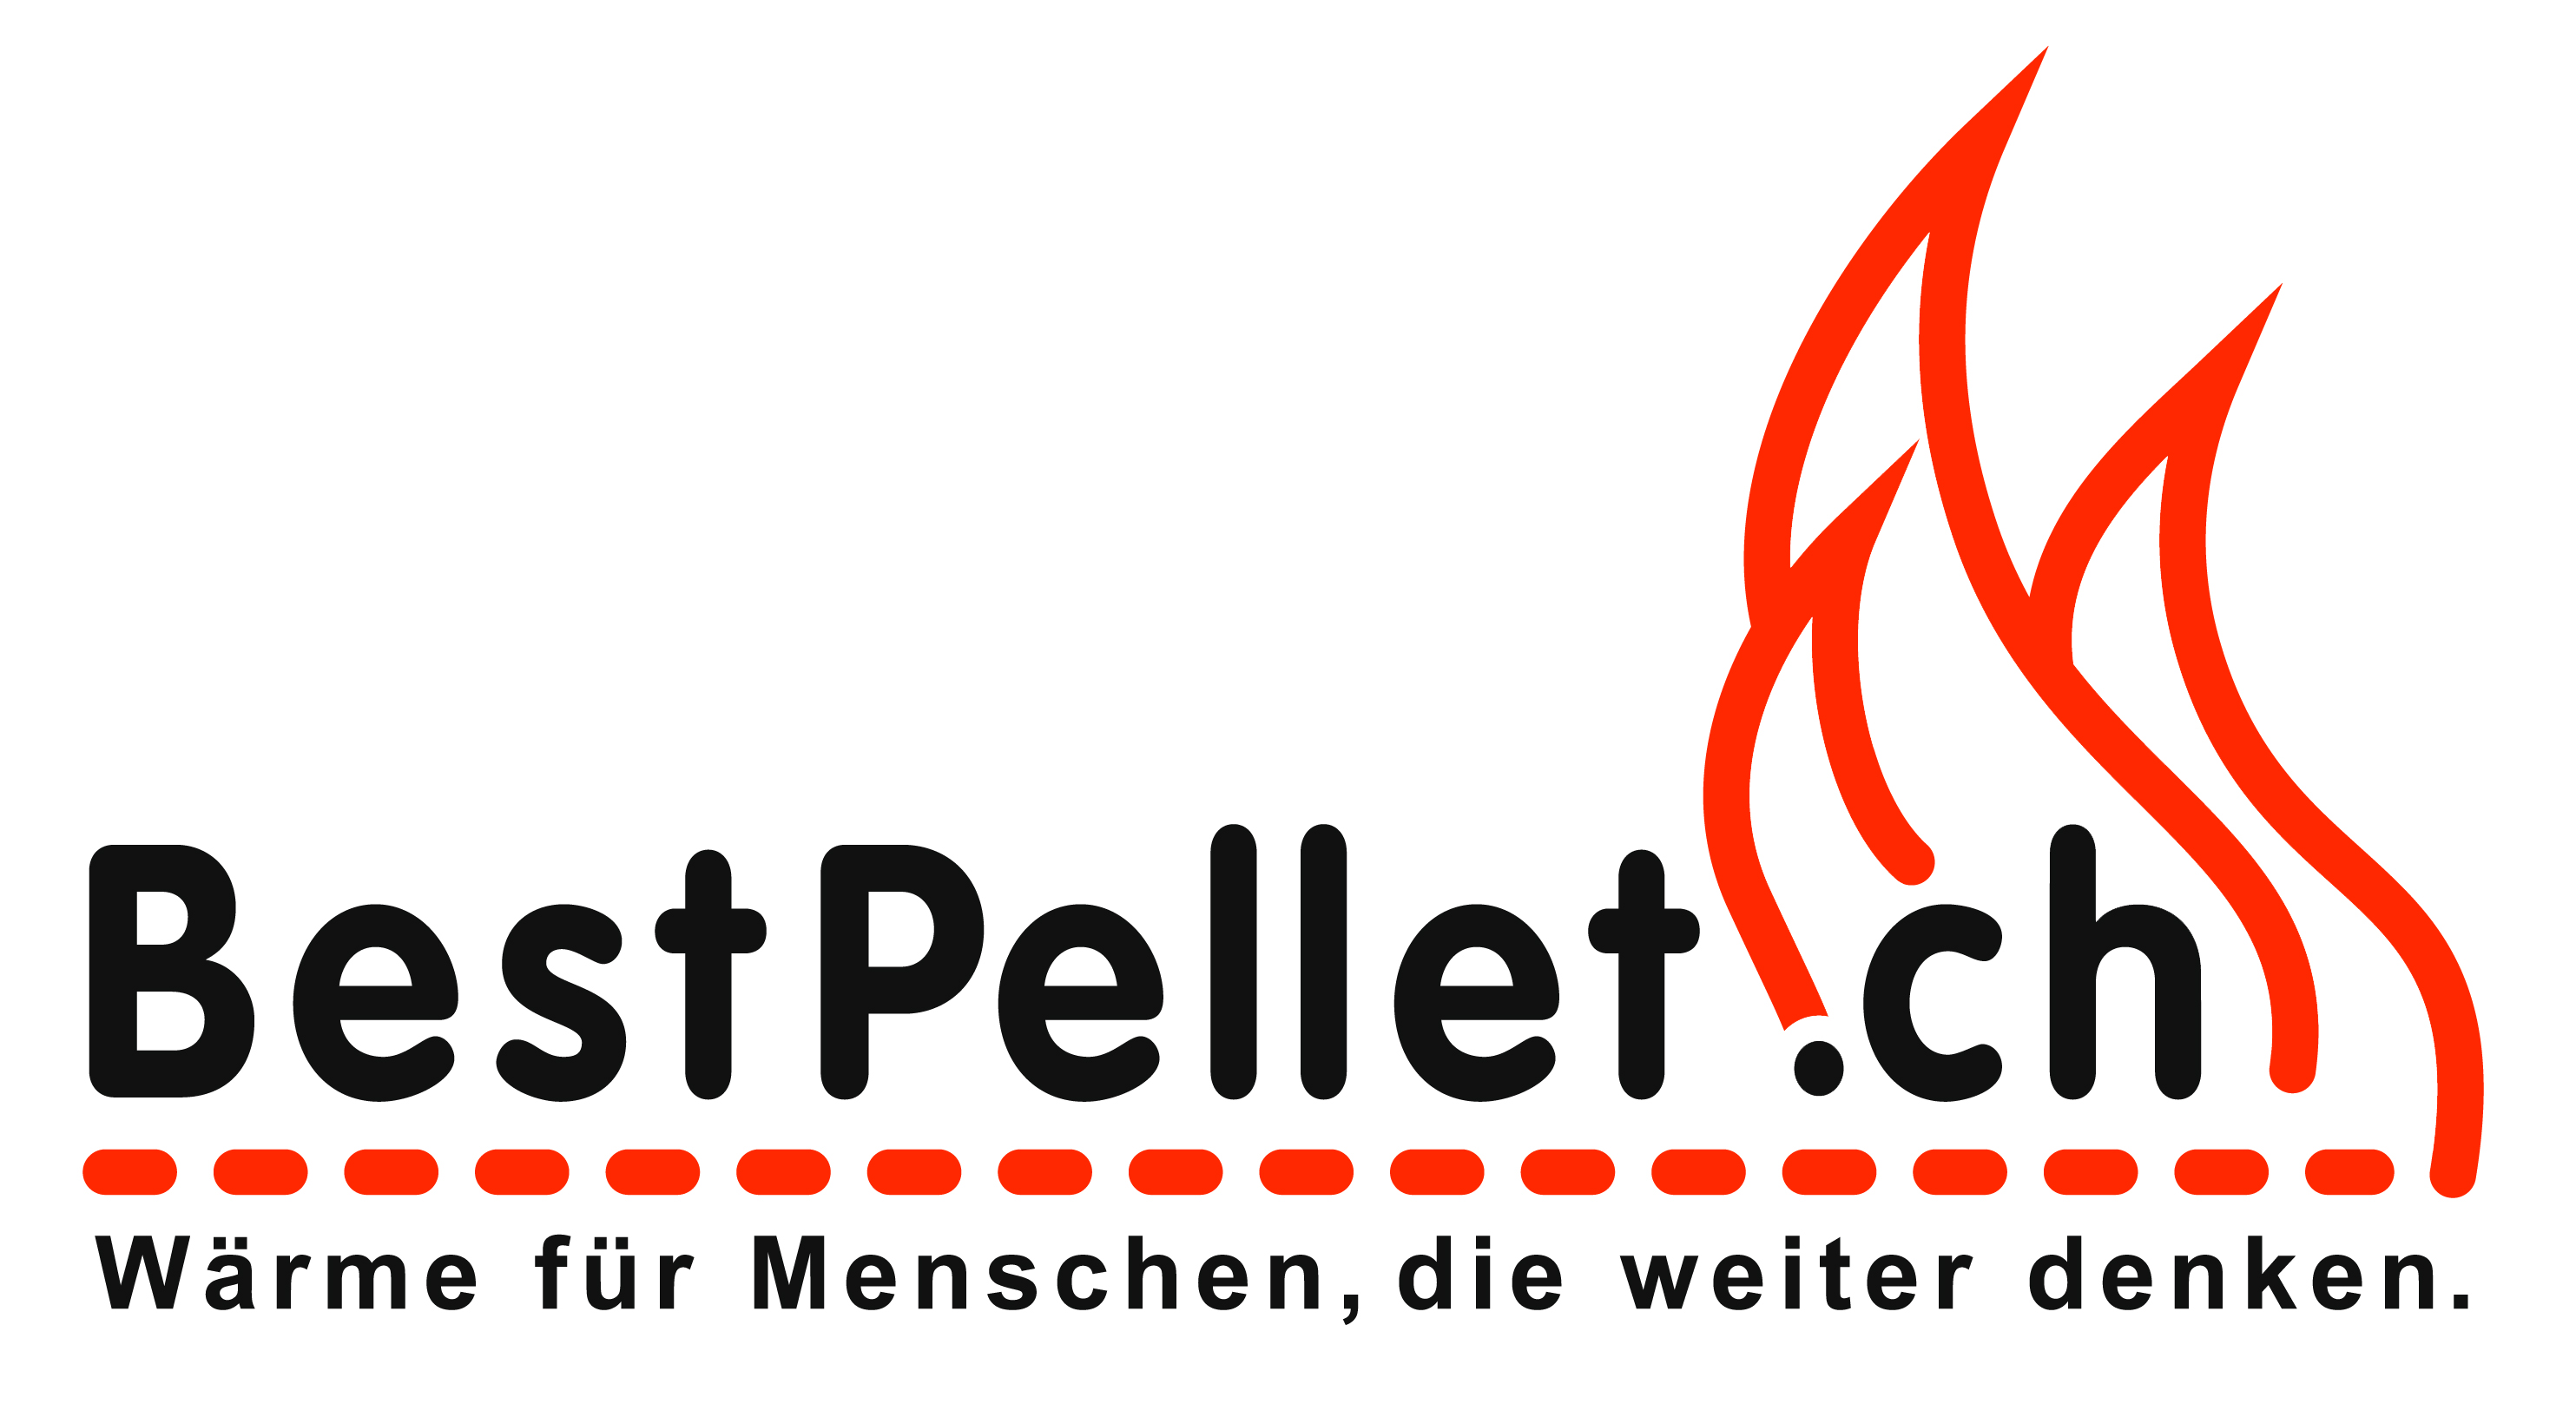 Best pellet